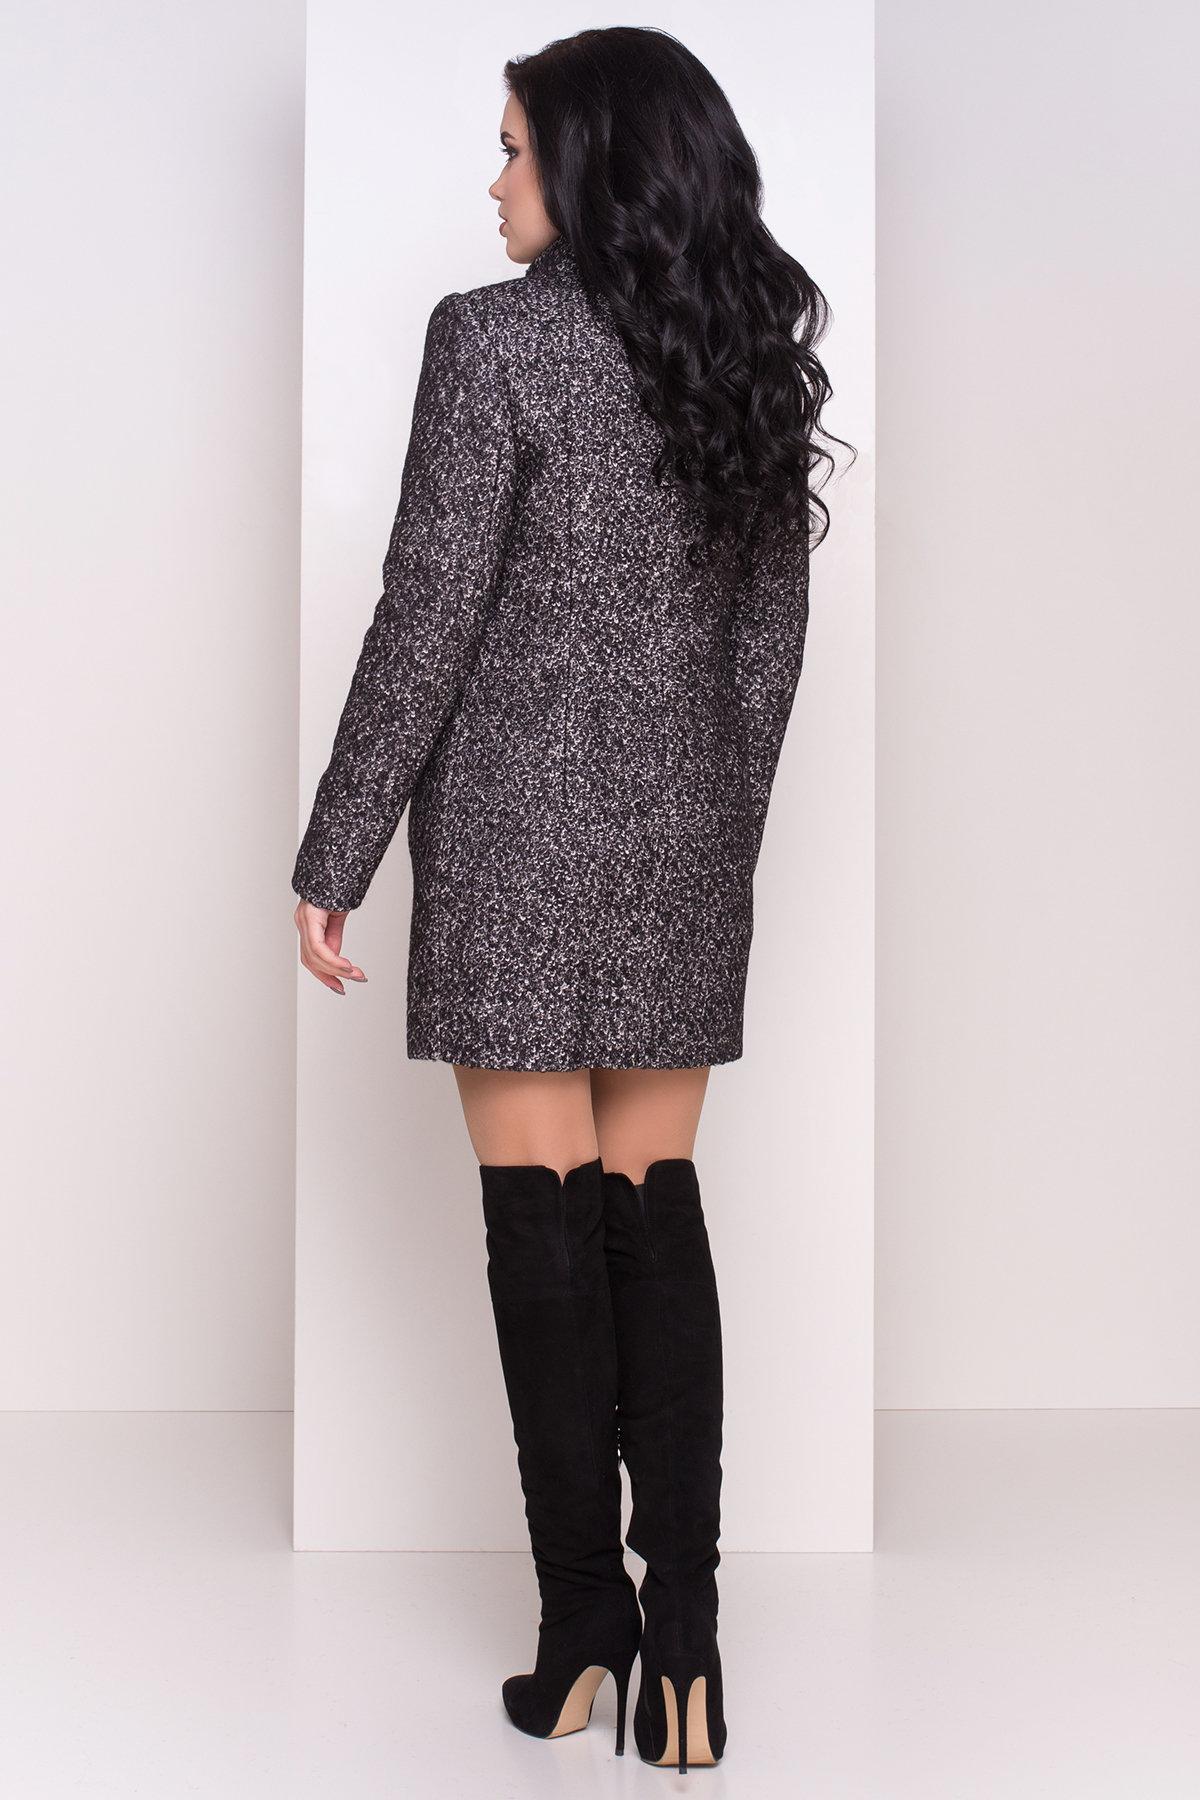 Пальто зима Сан-Ремо 0939 Цвет: Черный / серый 6